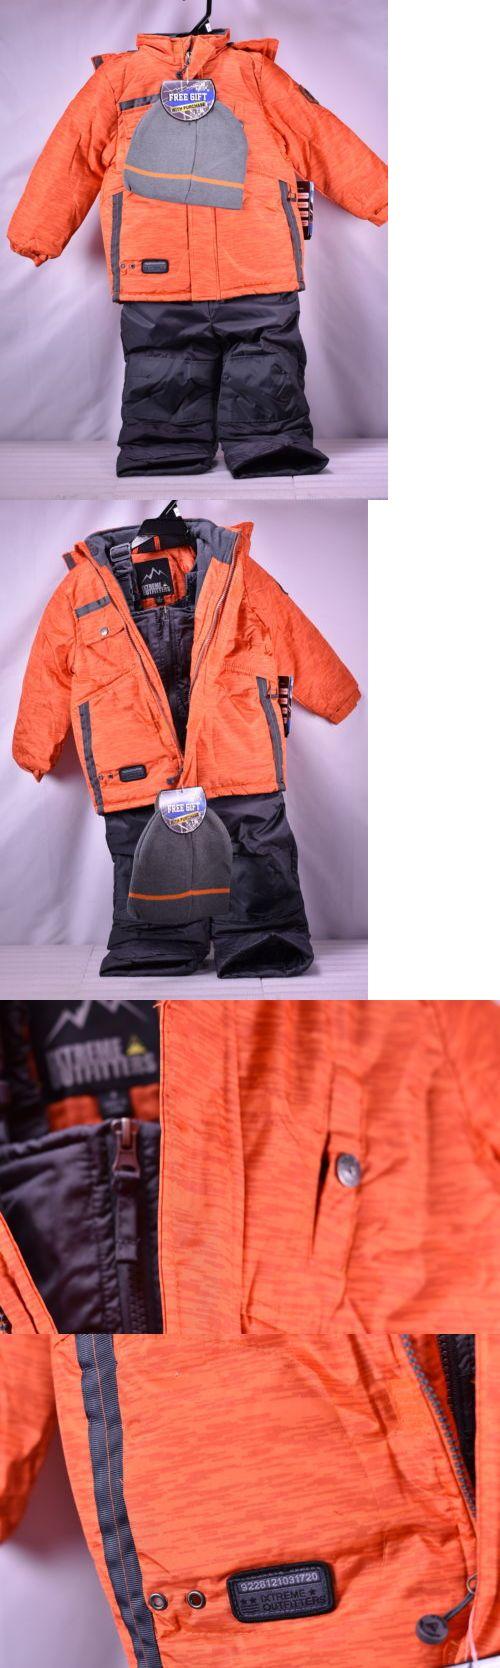 9b433a819192 Outerwear 51933  Ixtreme Little Boys Tonal Print Snowsuit W Gaiter ...